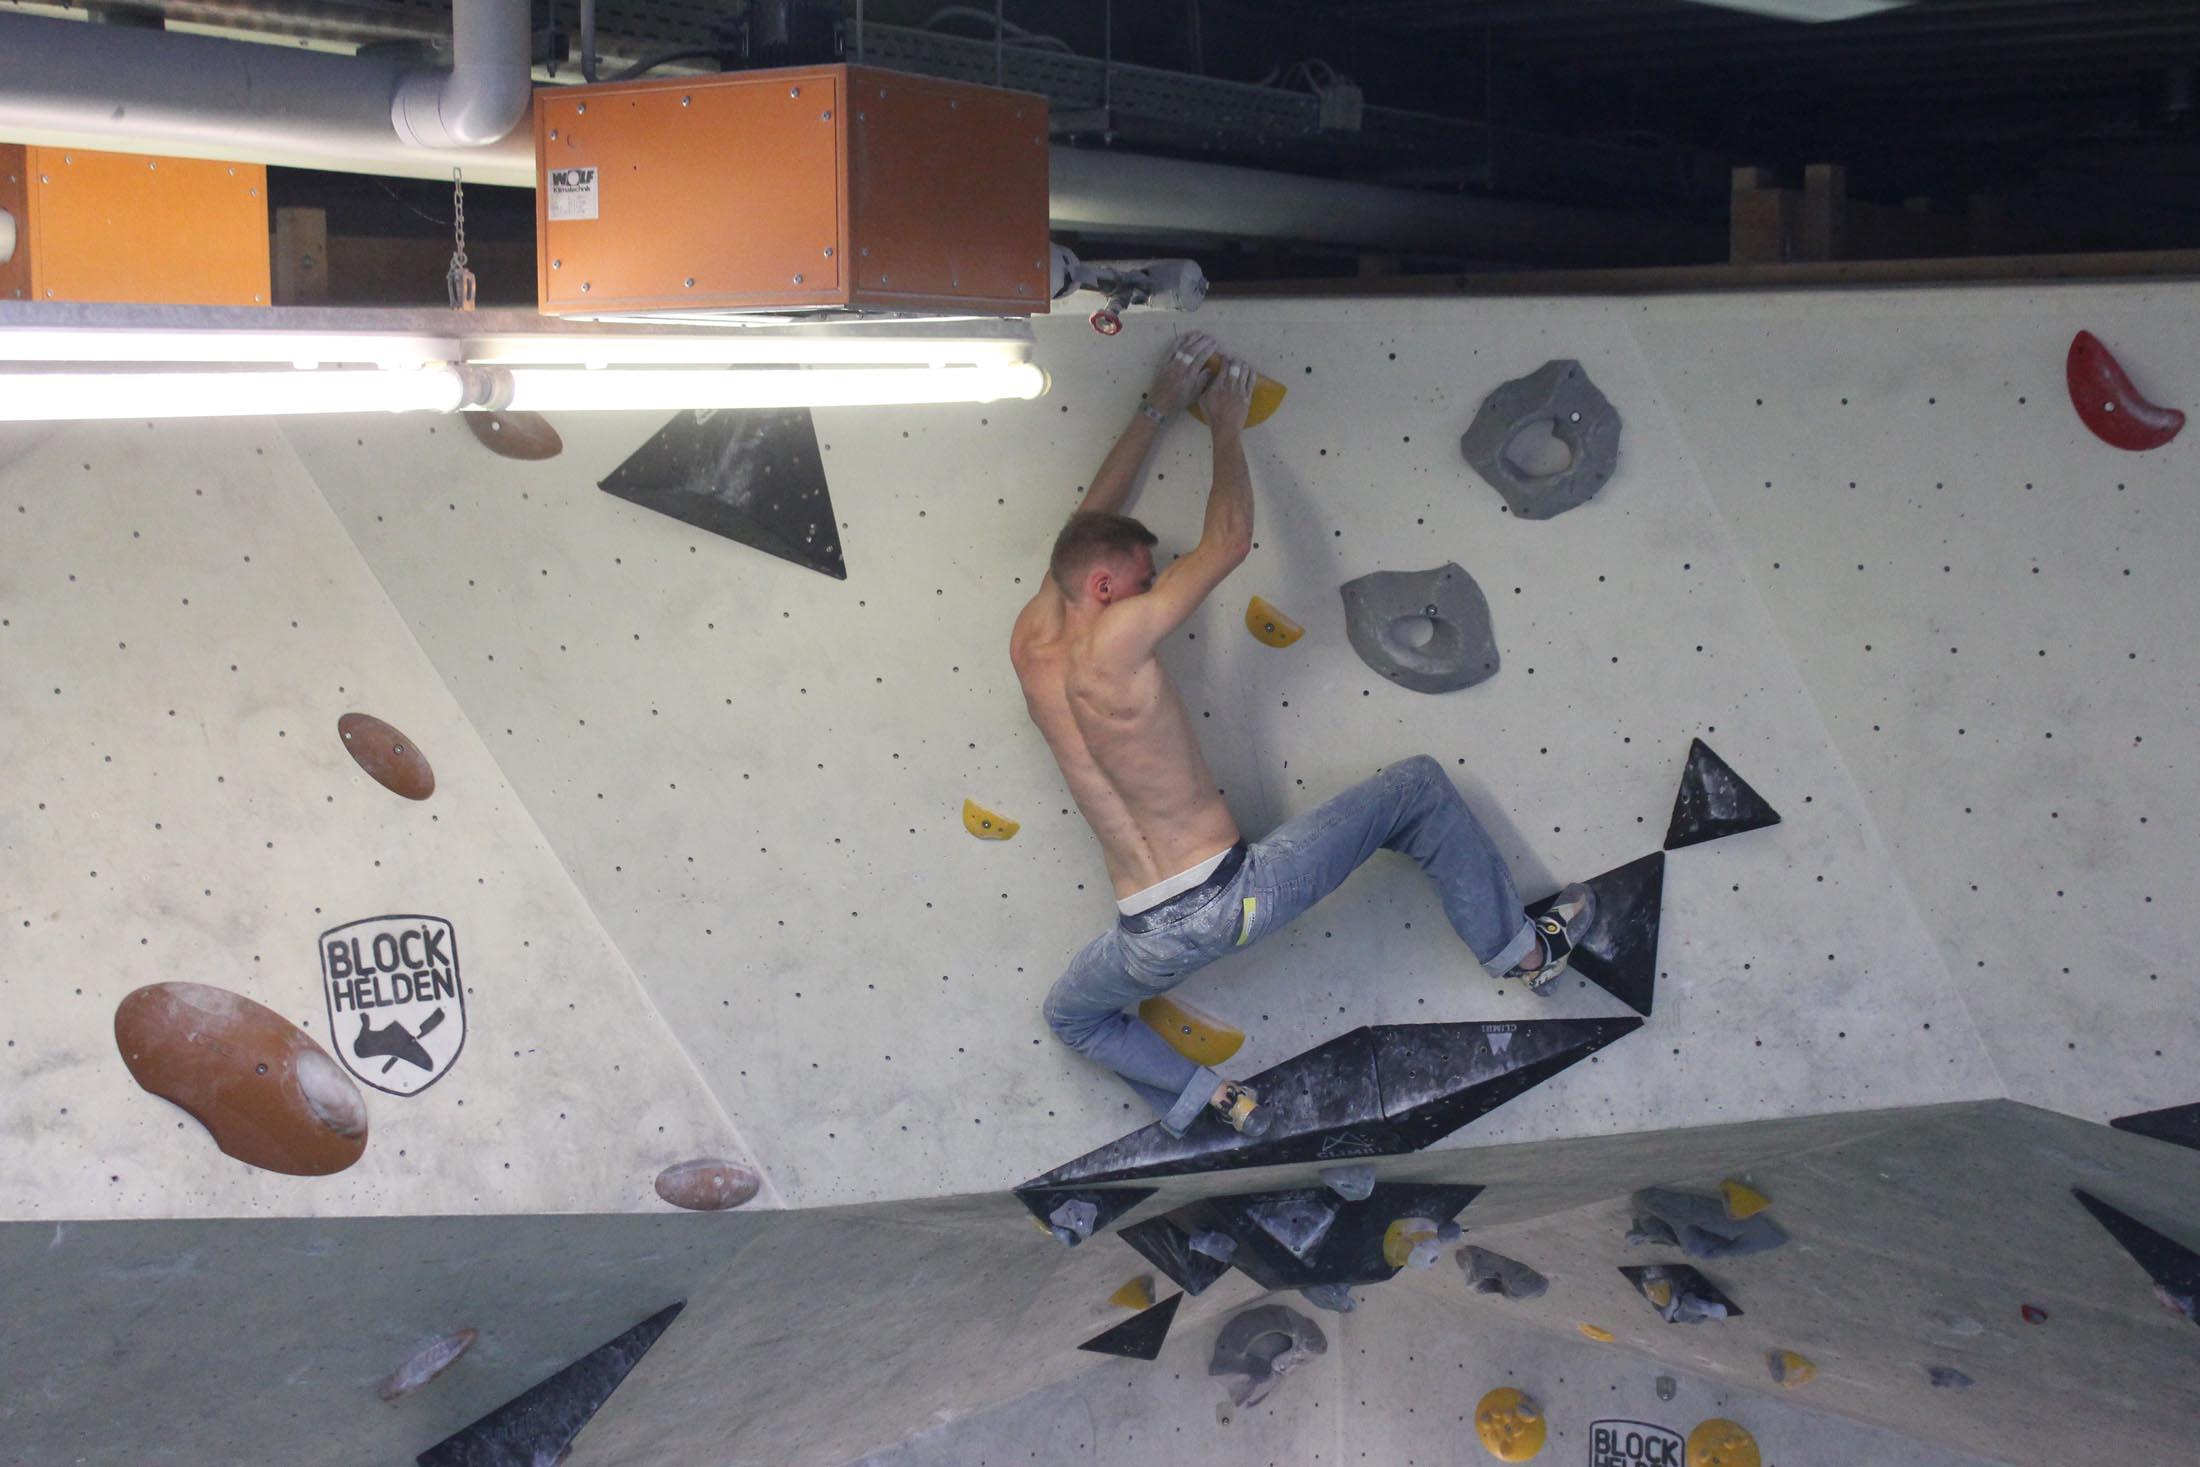 Quali, internationaler bouldercup Frankenjura 2016, BLOCKHELDEN Erlangen, Mammut, Bergfreunde.de, Boulderwettkampf07092016286